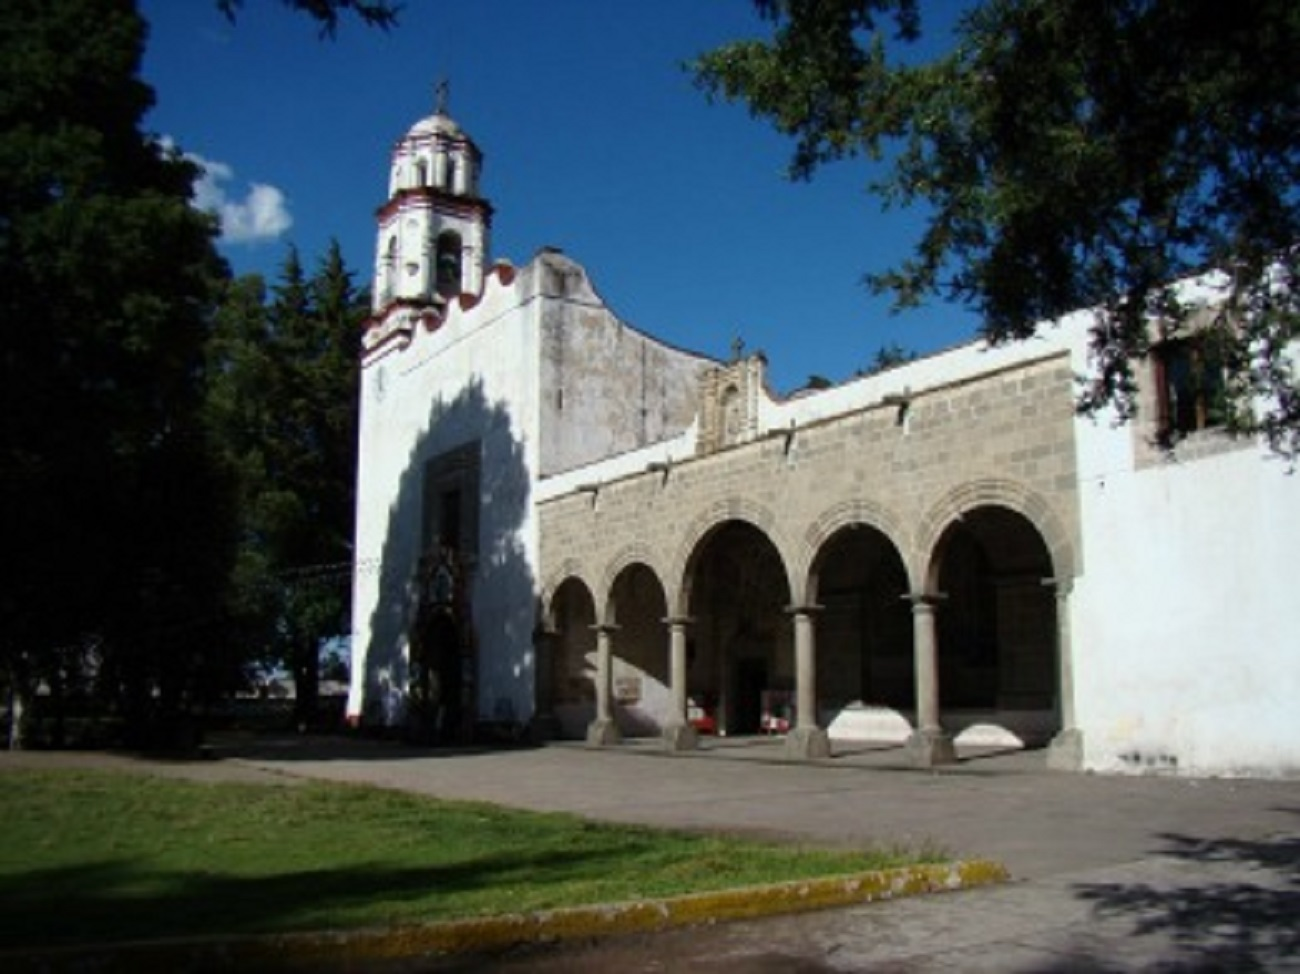 Museo Virreinal de Zinacantepec, patrimonio mexiquense